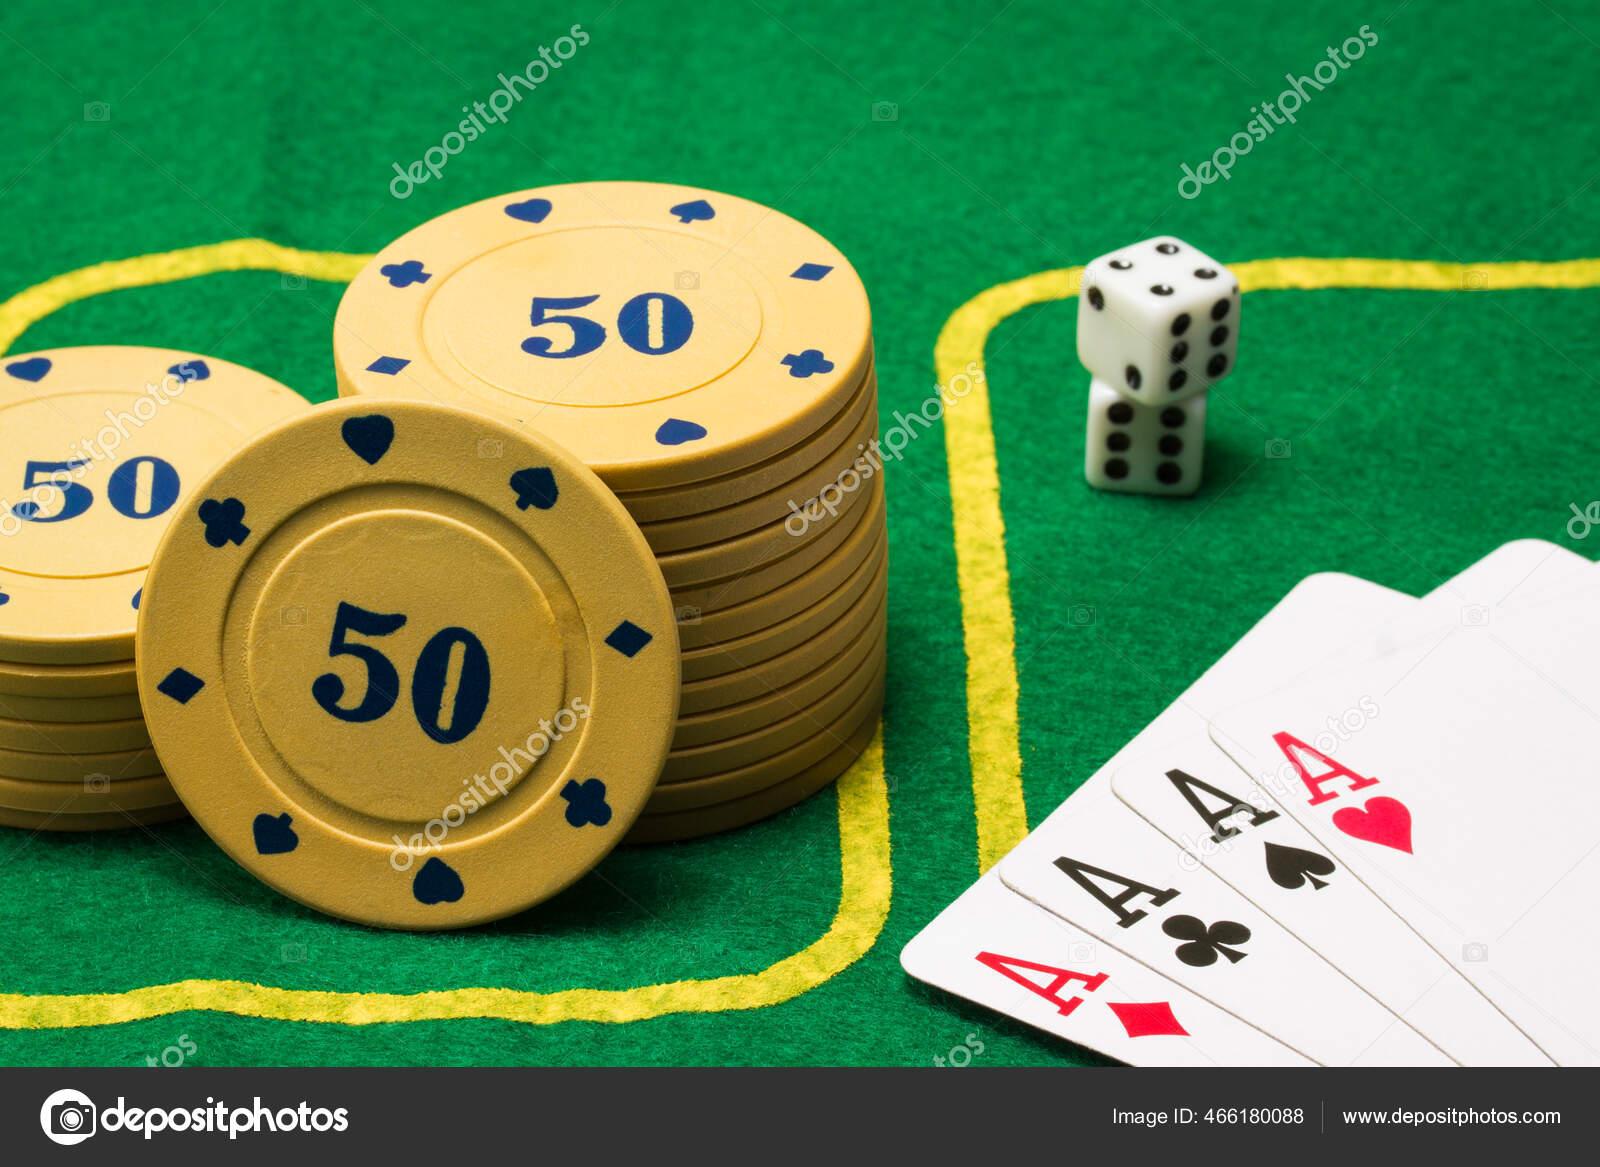 Chip Poker Dadu Dan Empat Objek Untuk Papan Permainan Populer — Stok Foto ©  nesterovoleg129 #466180088